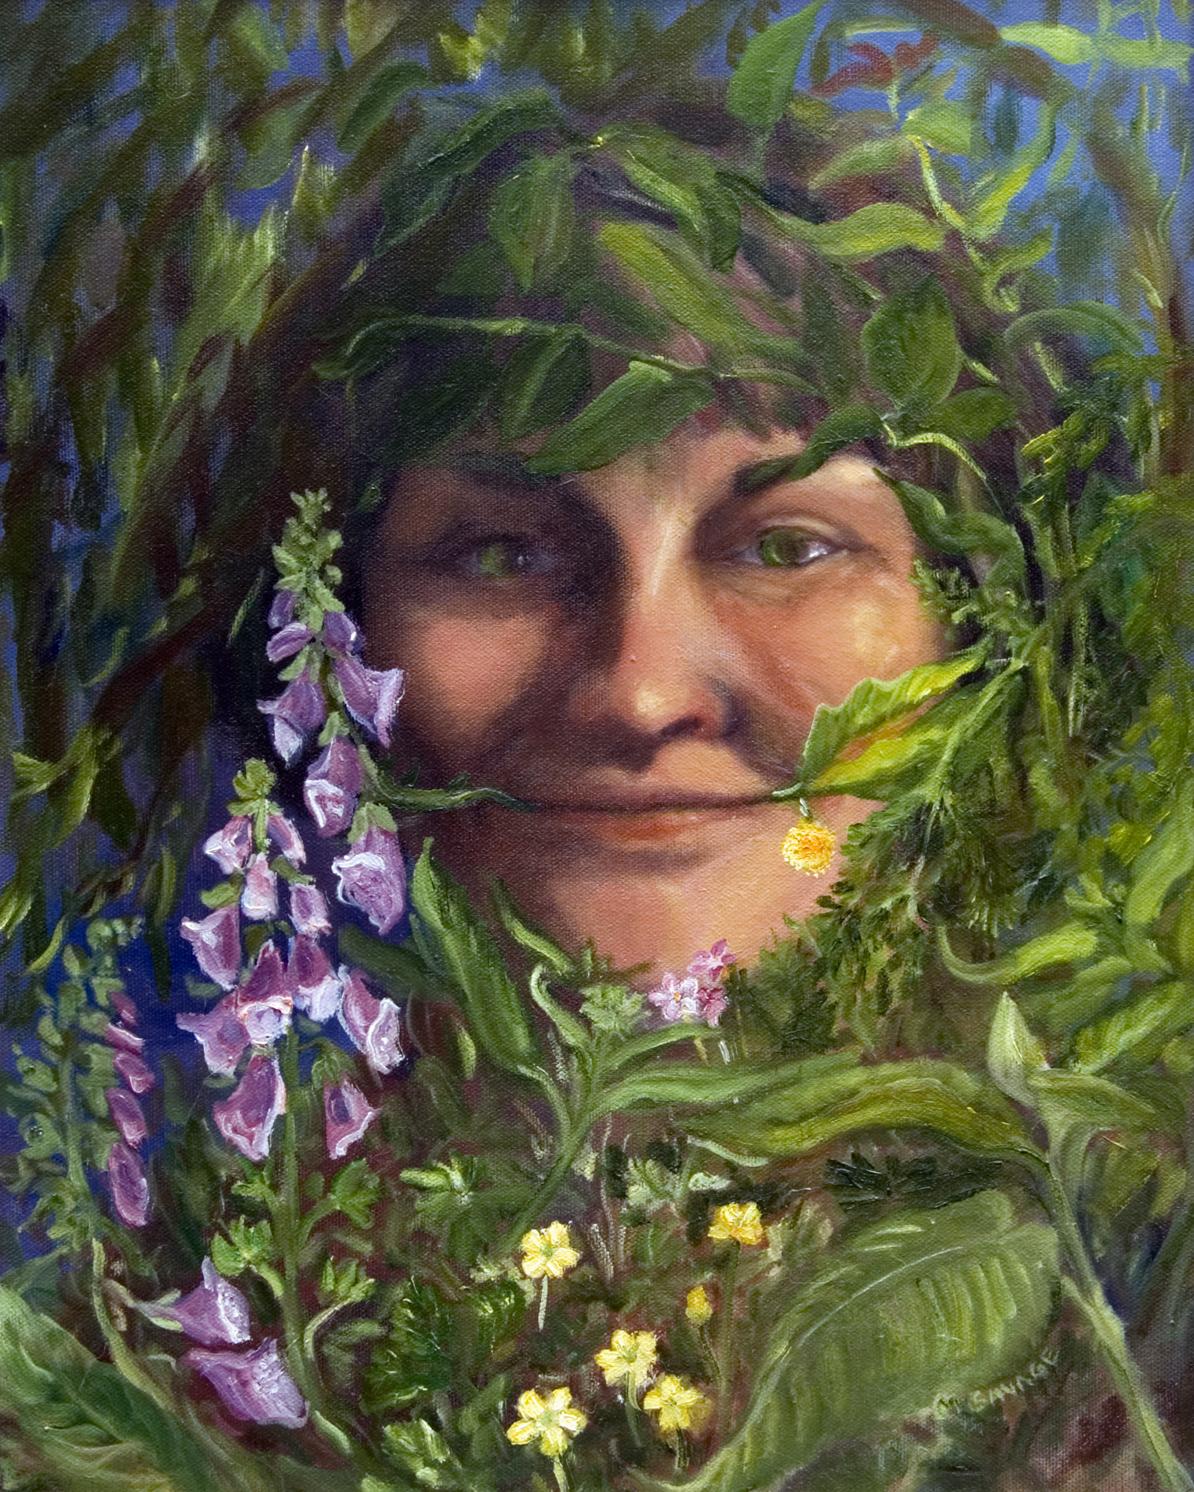 Portrait of a Green Woman